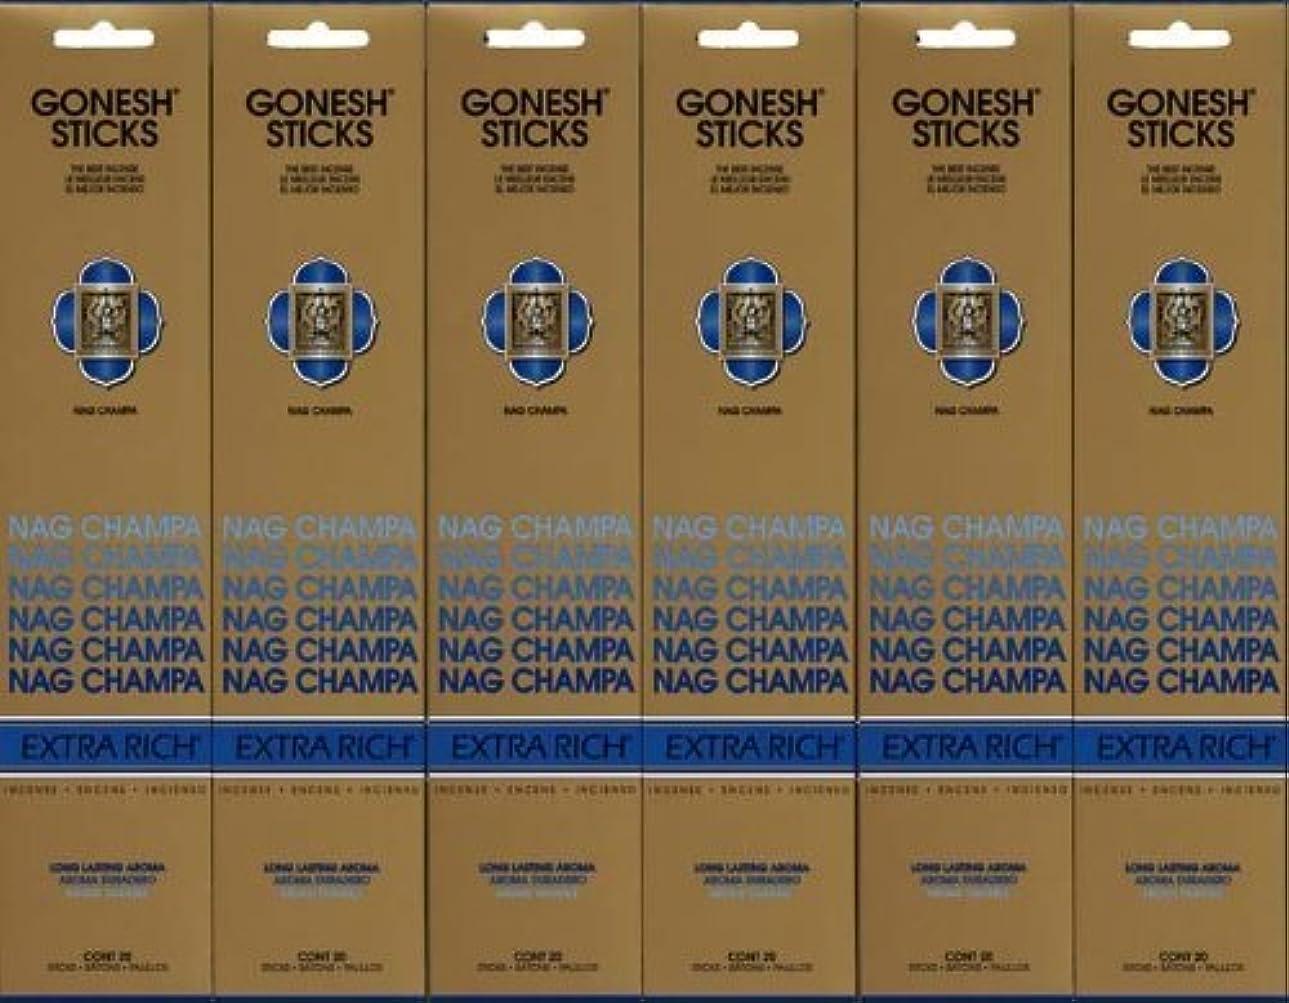 GONESH NAG CHAMPA ナグチャンパ スティック 20本入り X 6パック (120本)